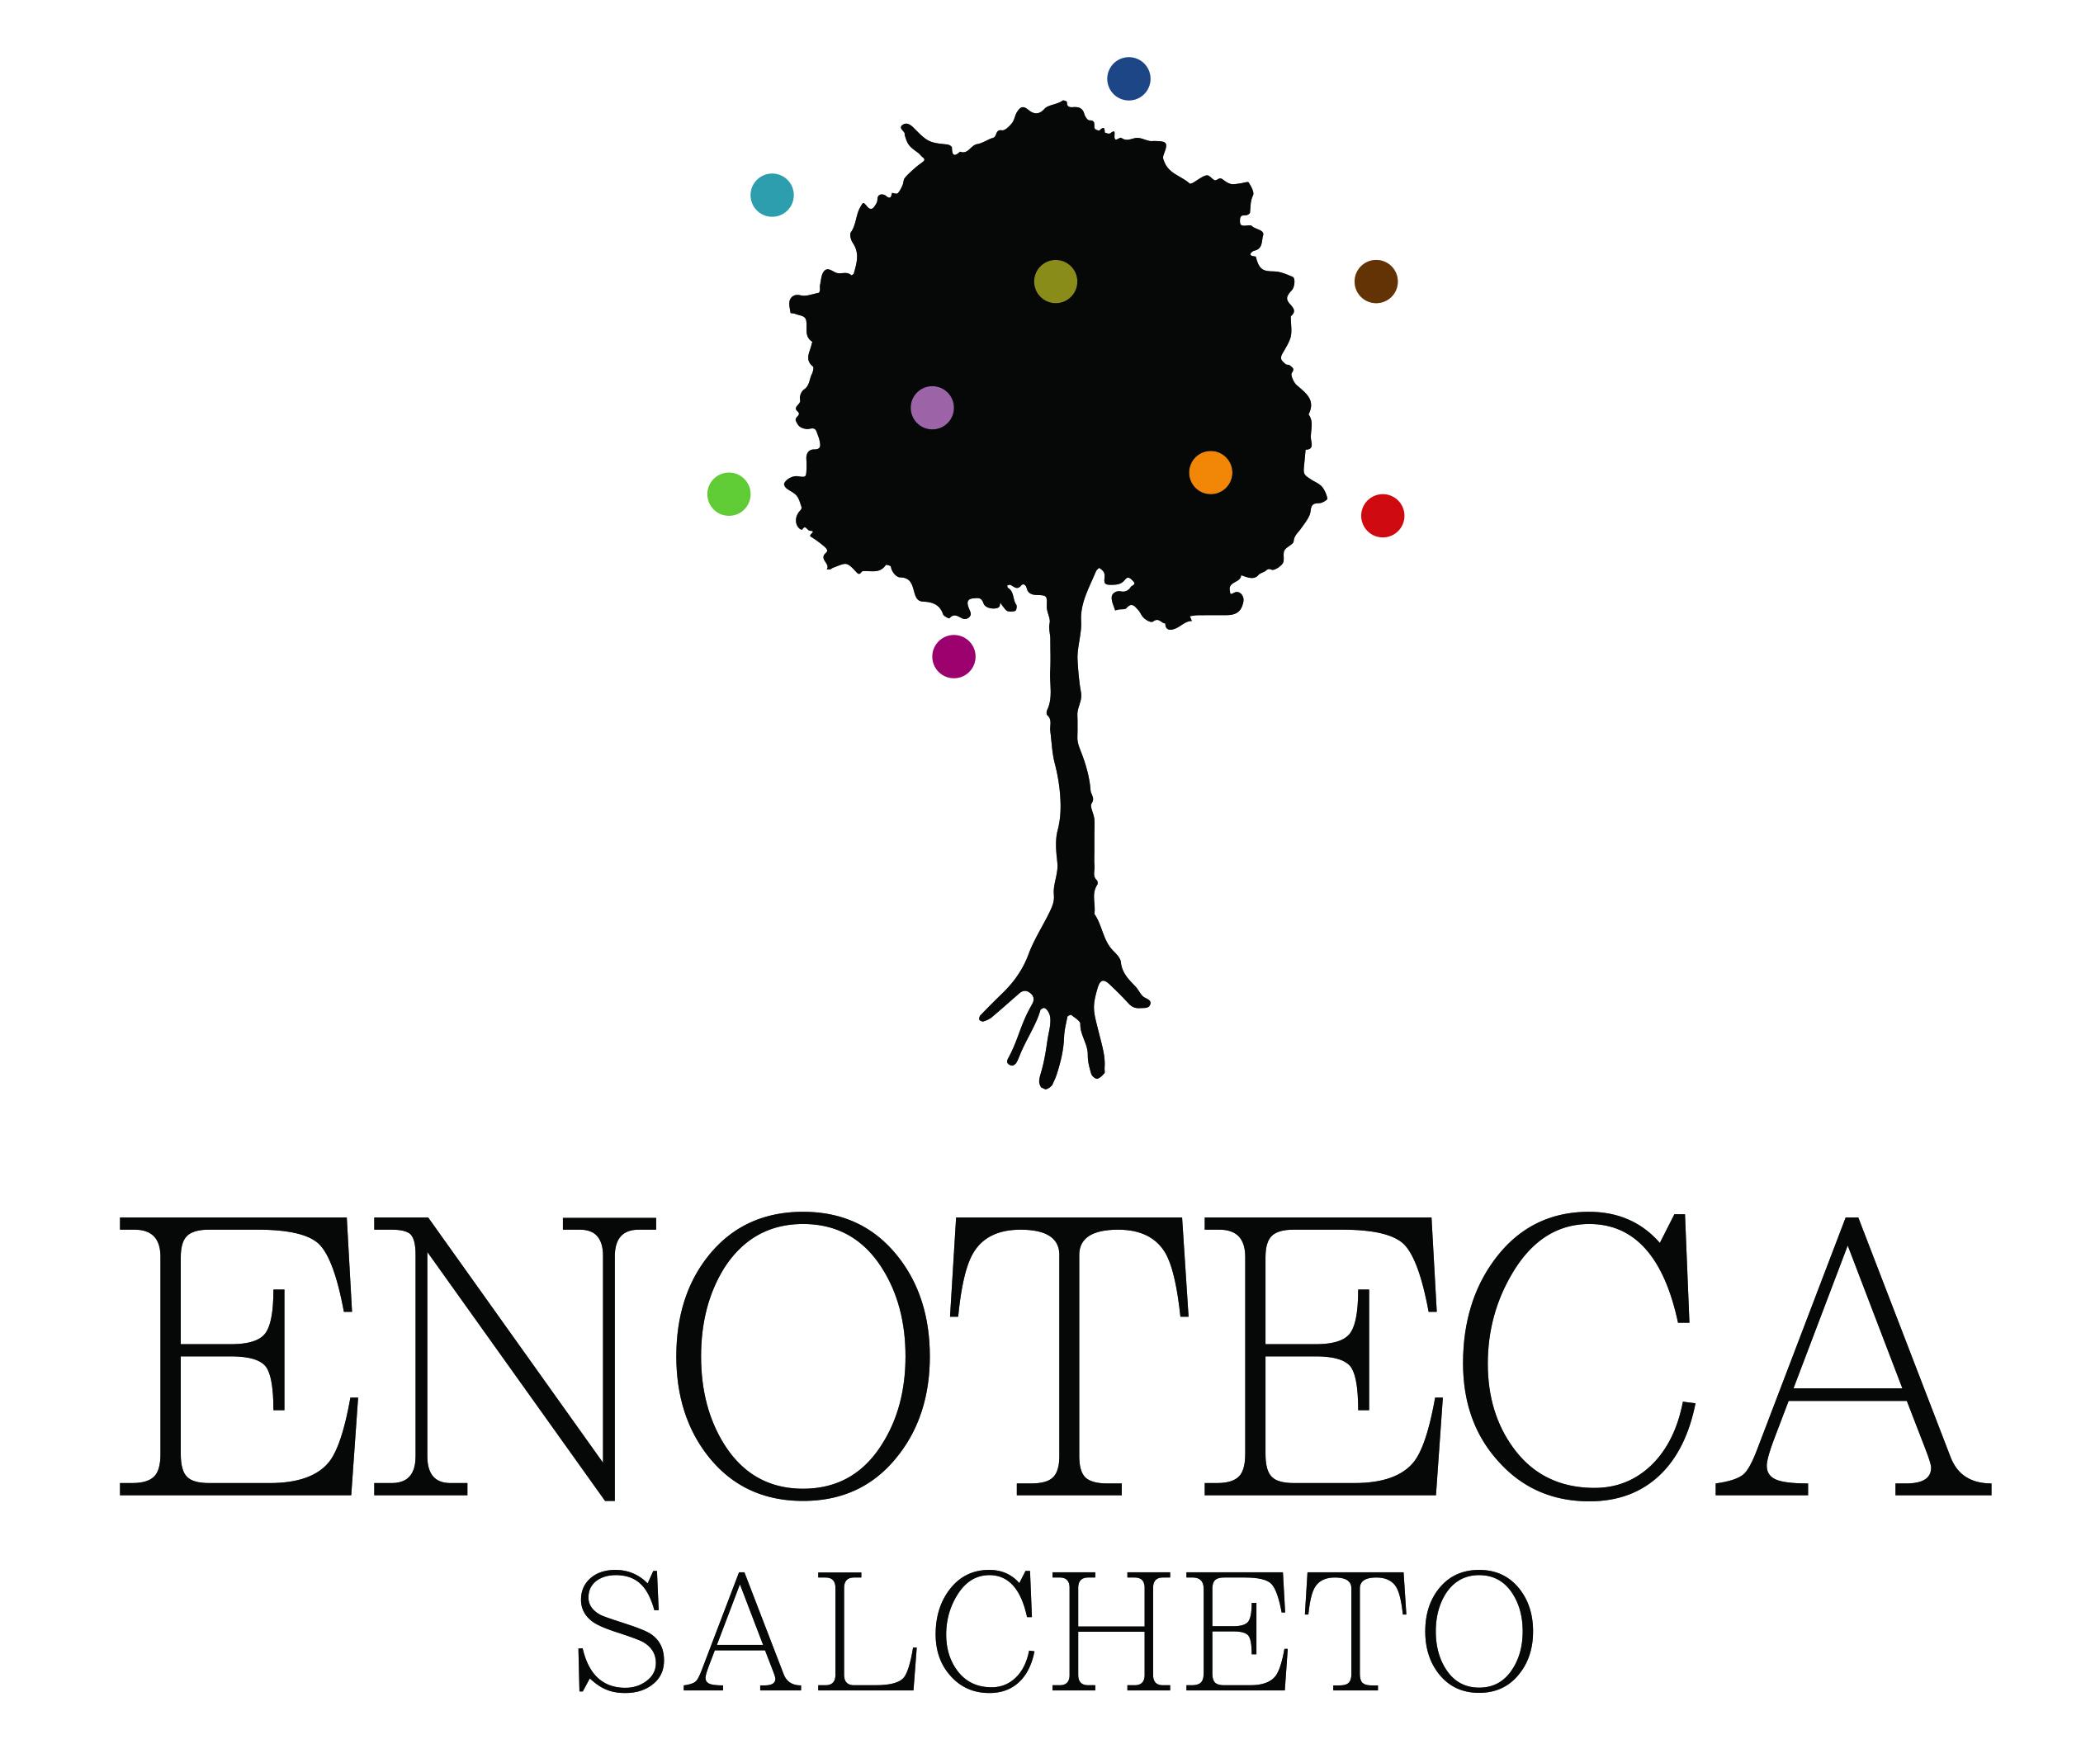 enoteca_salcheto_logo_colori